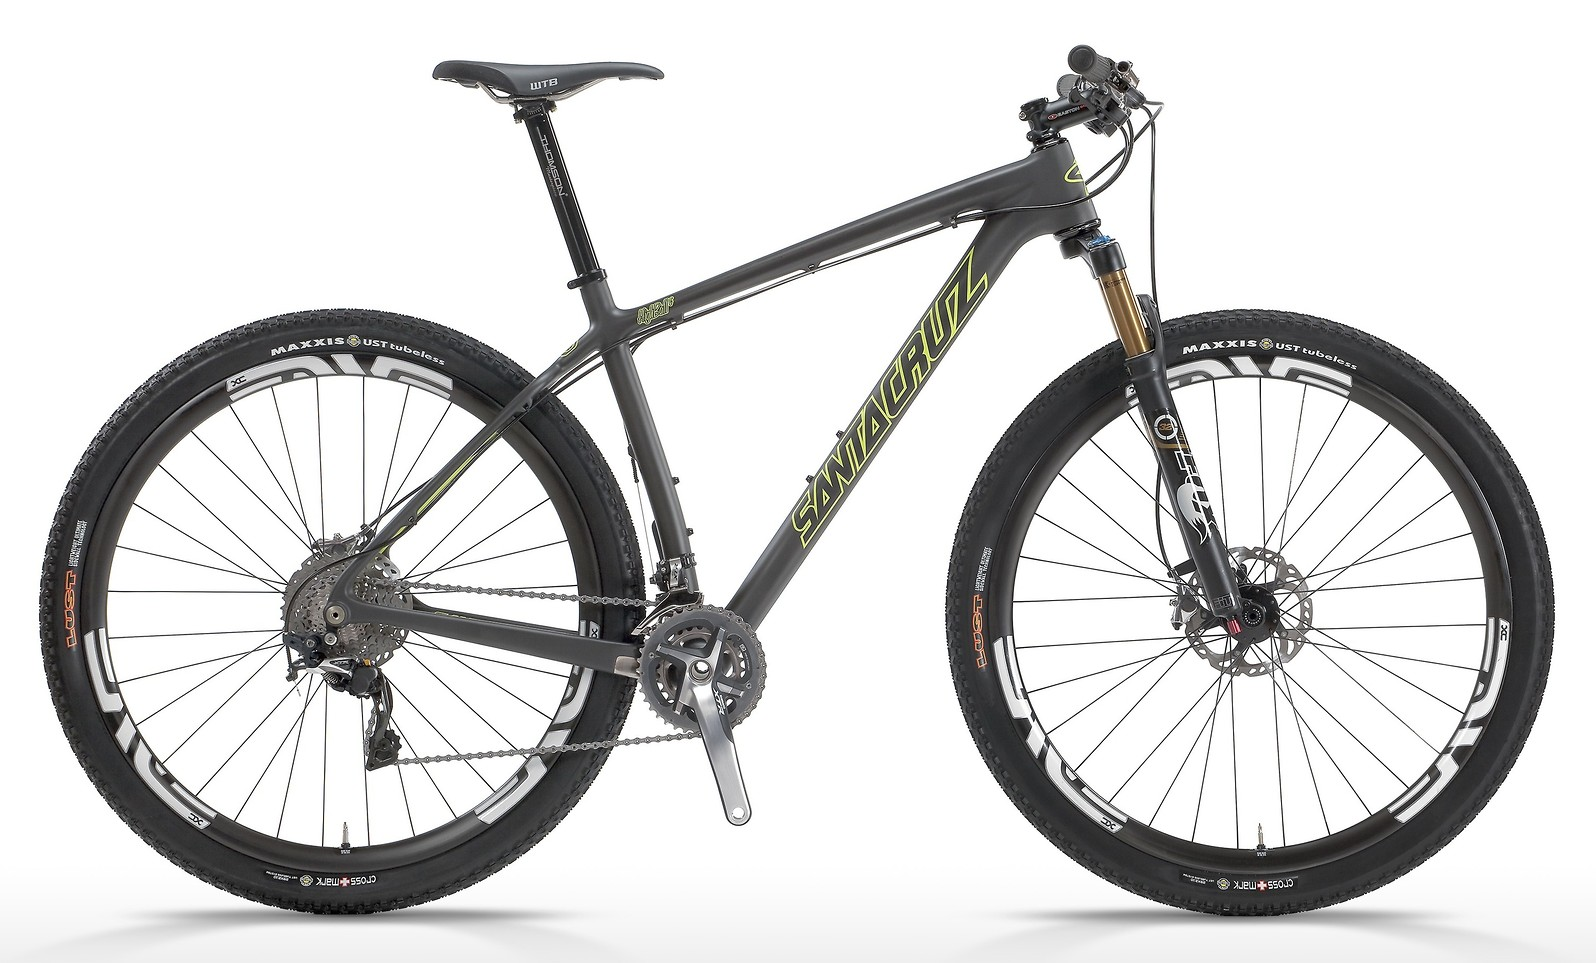 2014 Santa Cruz Highball Carbon XTR XC 29 Bike 2013 HIGHBALL Ccatalogflat